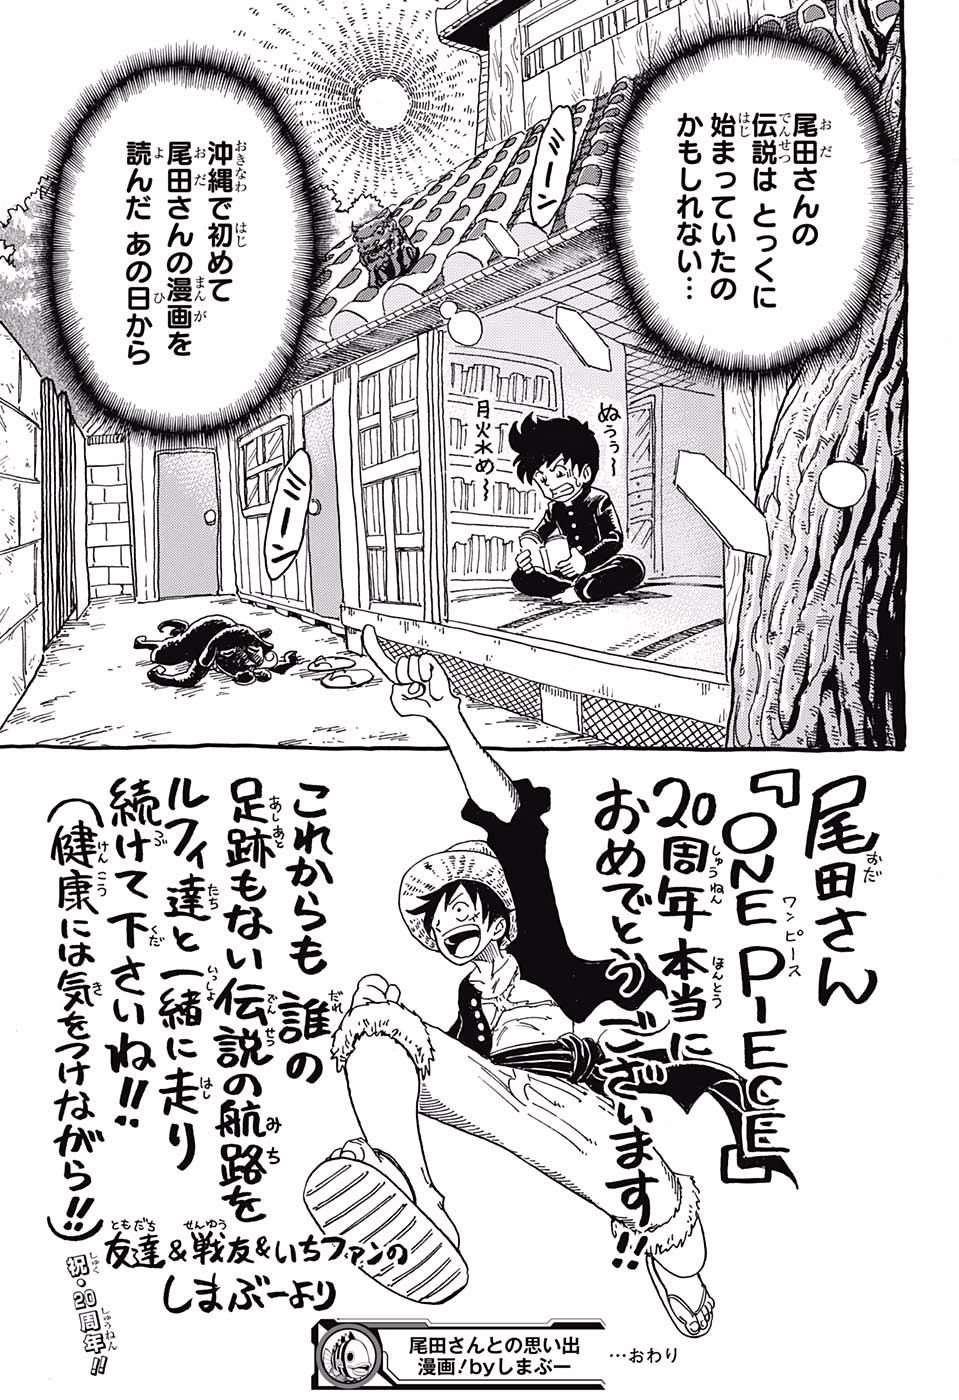 One Piece Manga 2017 CqUh7HwU